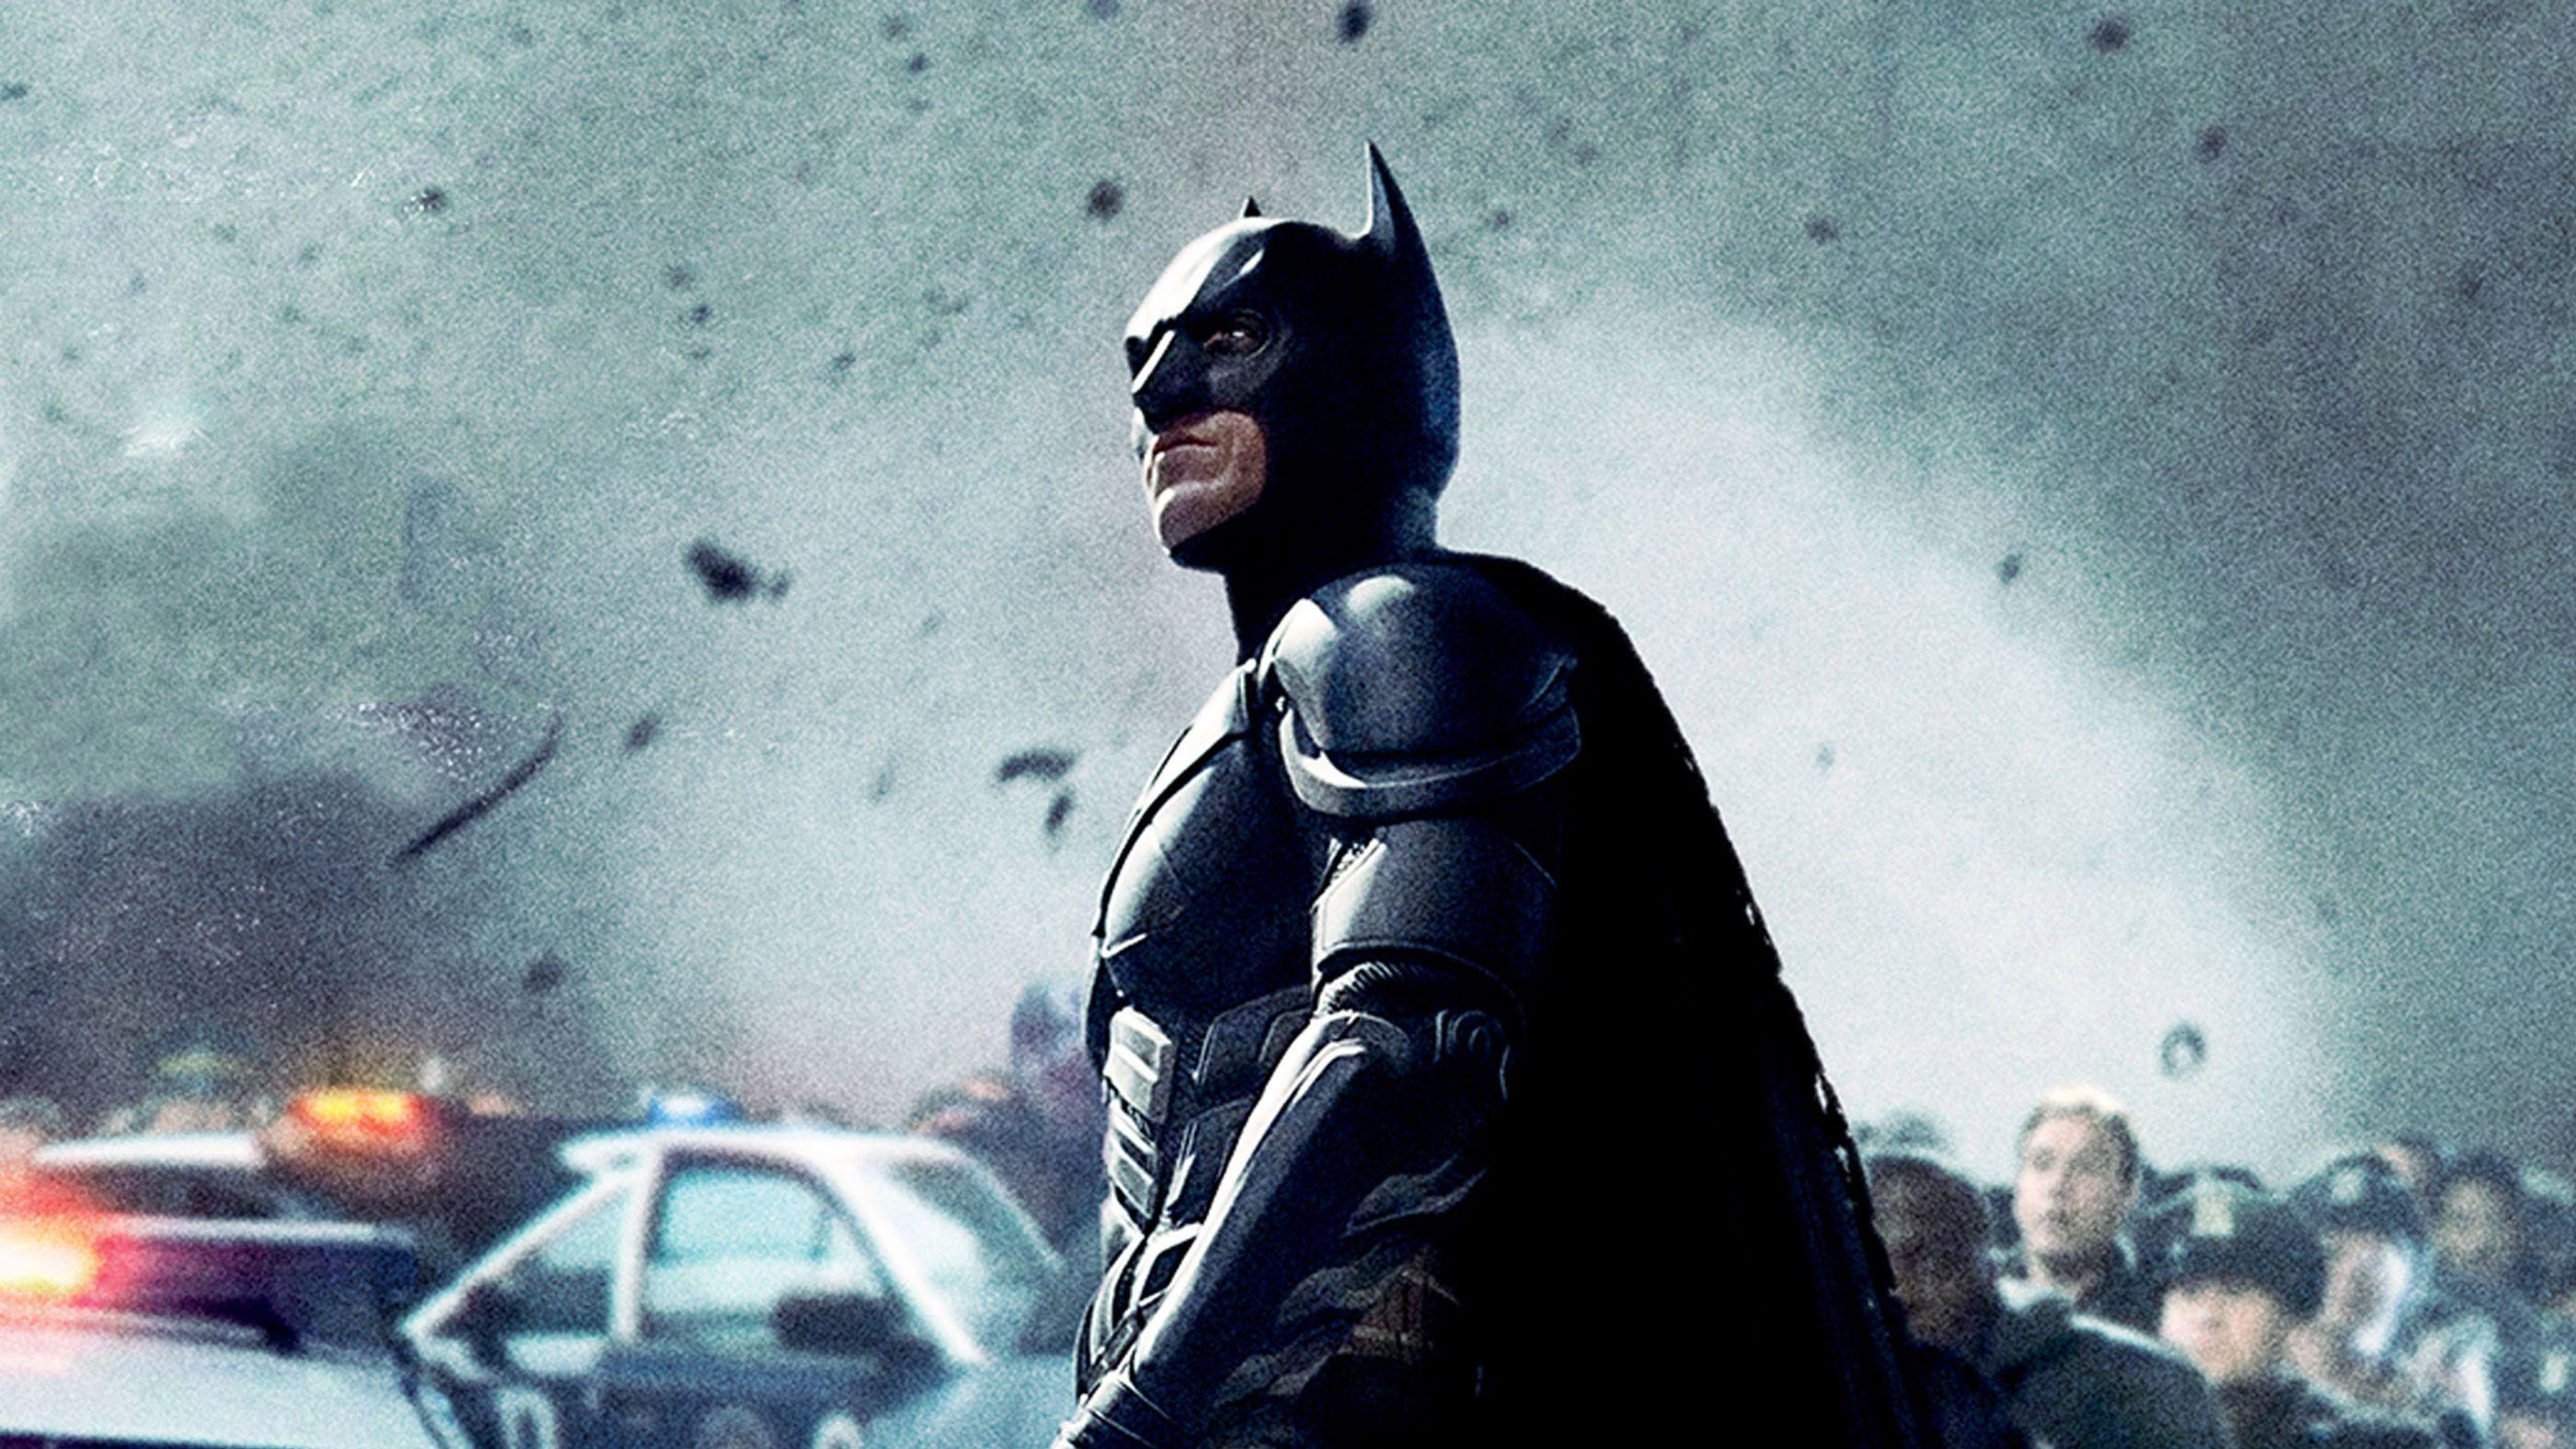 batman dark knight rises download in hindi filmywap